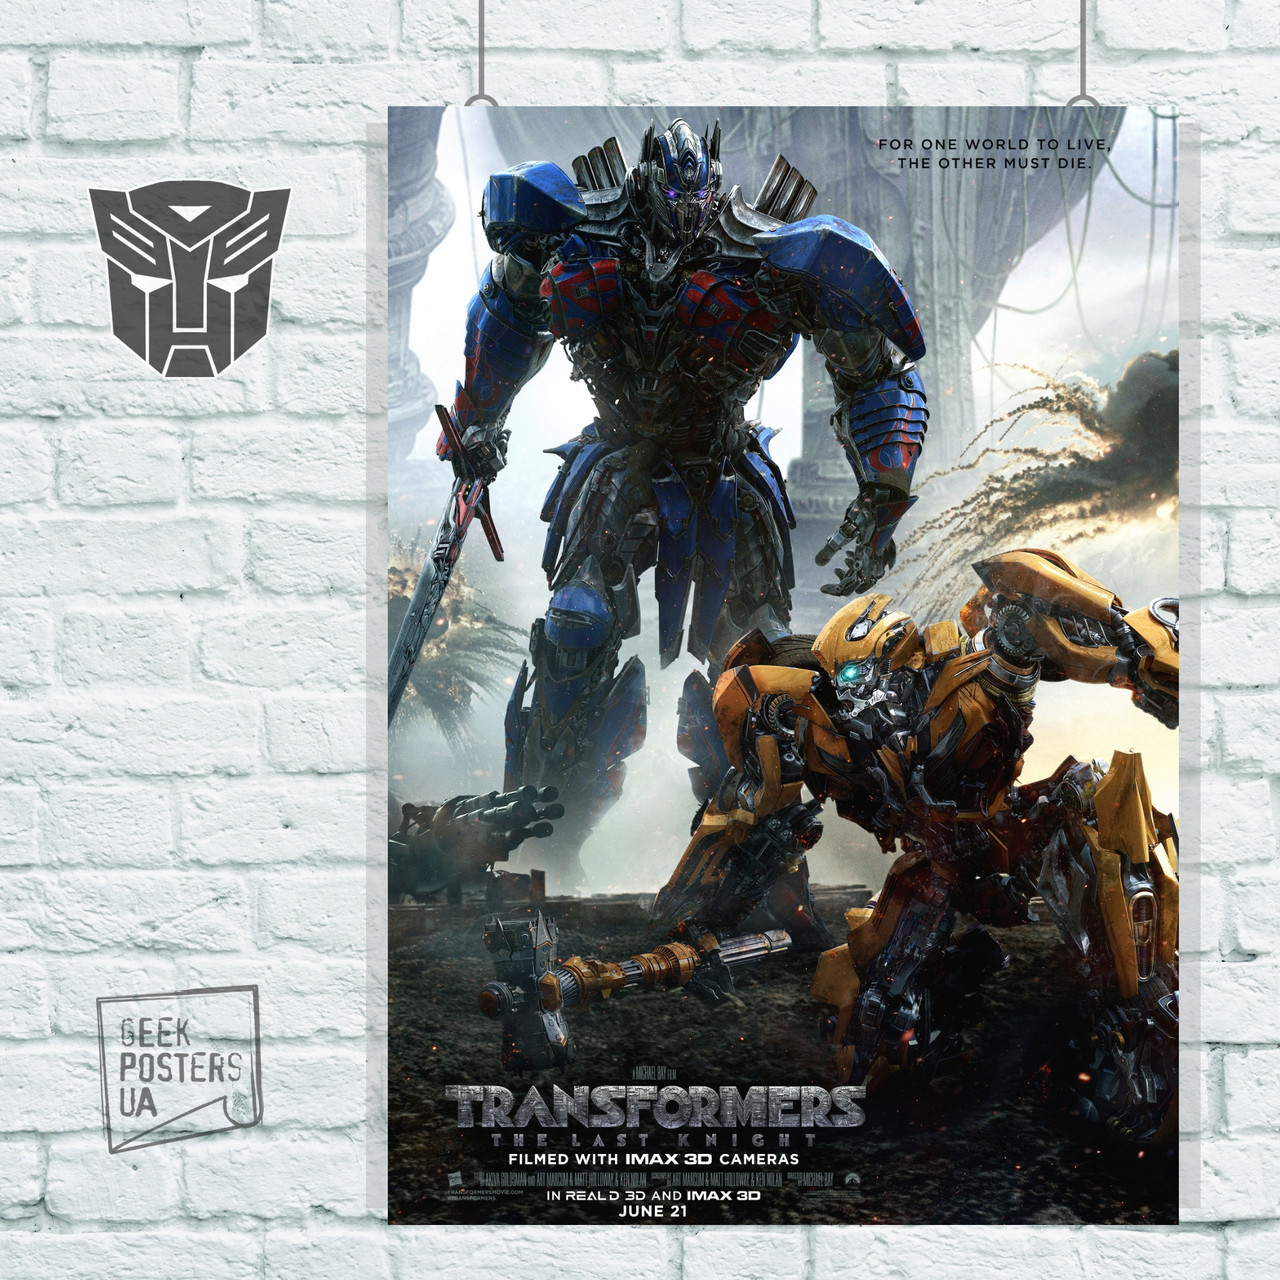 Постер Трансформеры 5: Последний рыцарь (2017). Размер 60x41см (A2). Глянцевая бумага